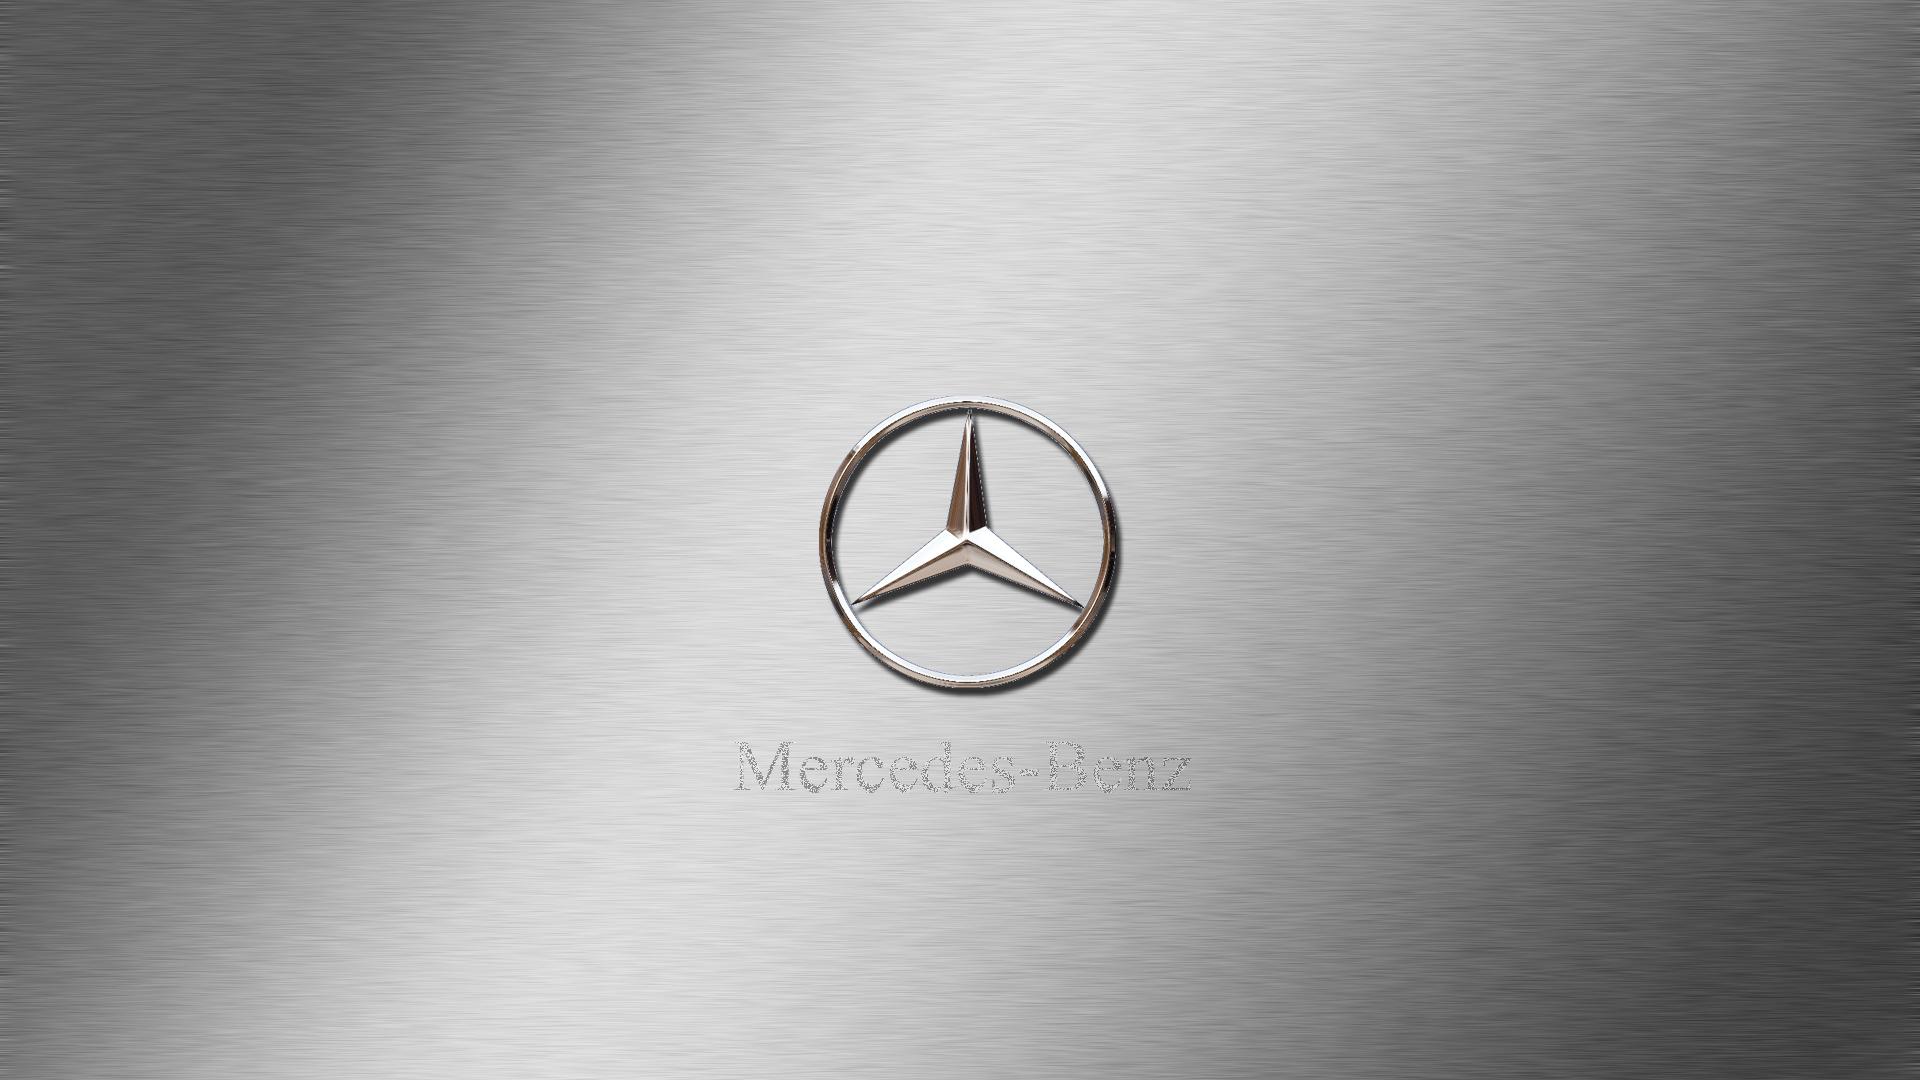 Amazing Mercedes Benz Logo Wallpaper Full HD Pictures 1920x1080